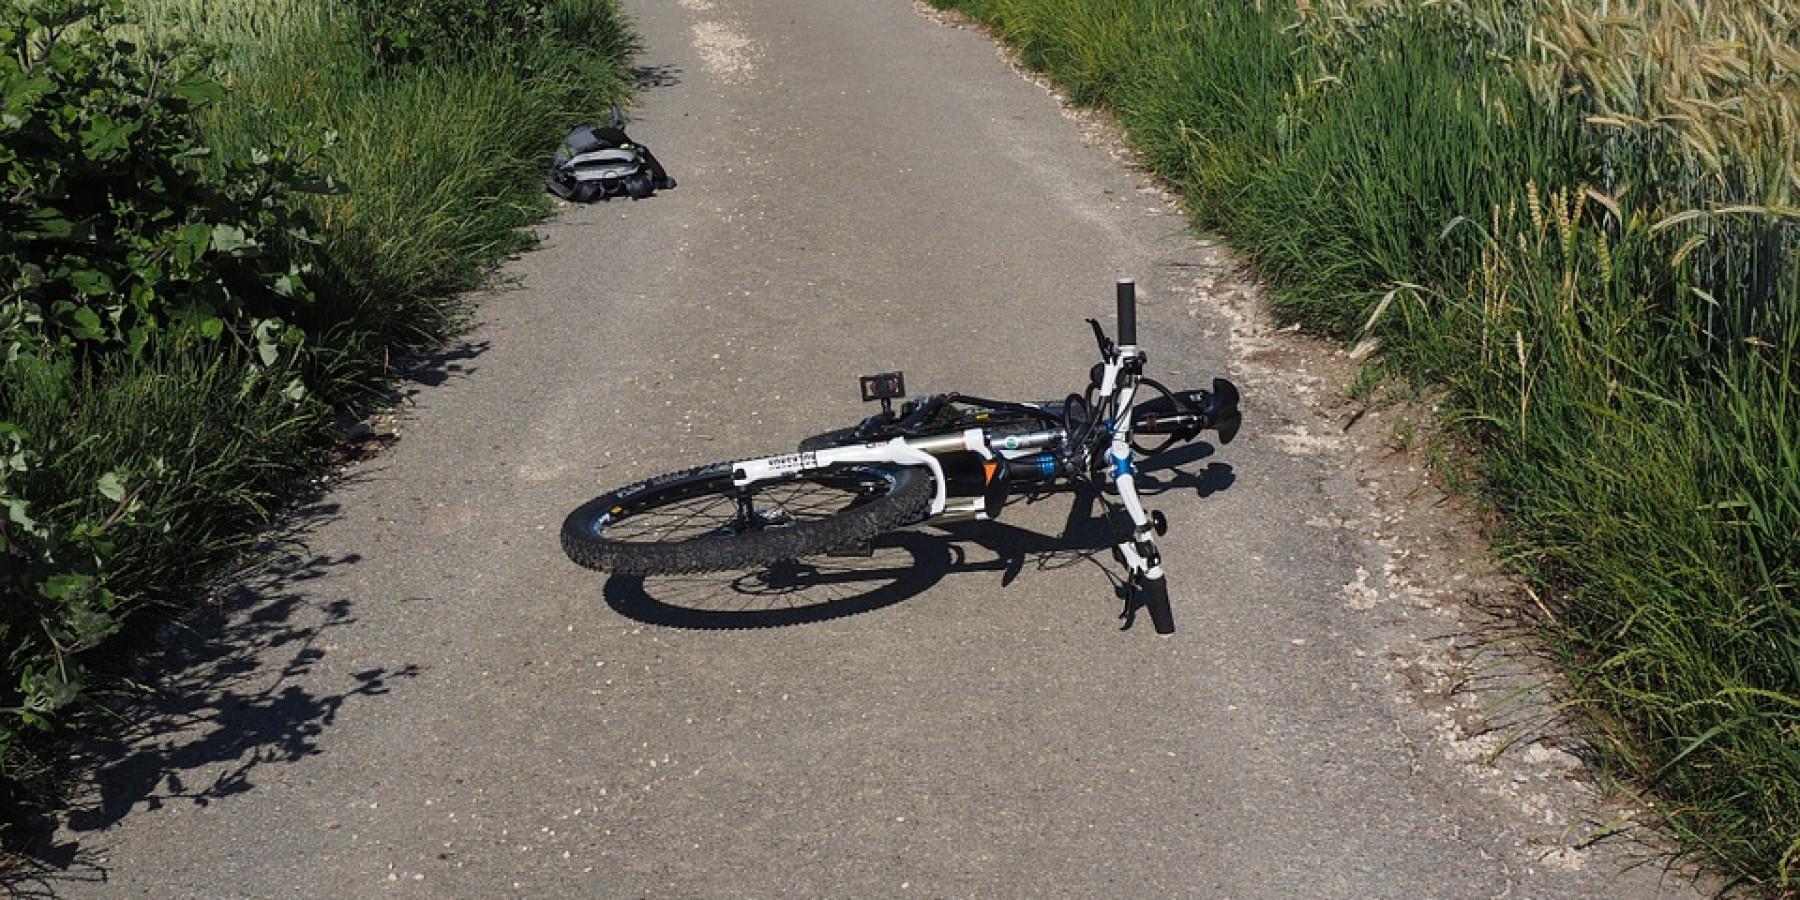 Polizisten stoppen Radfahrer auf A 1 – Positiver Drogentest